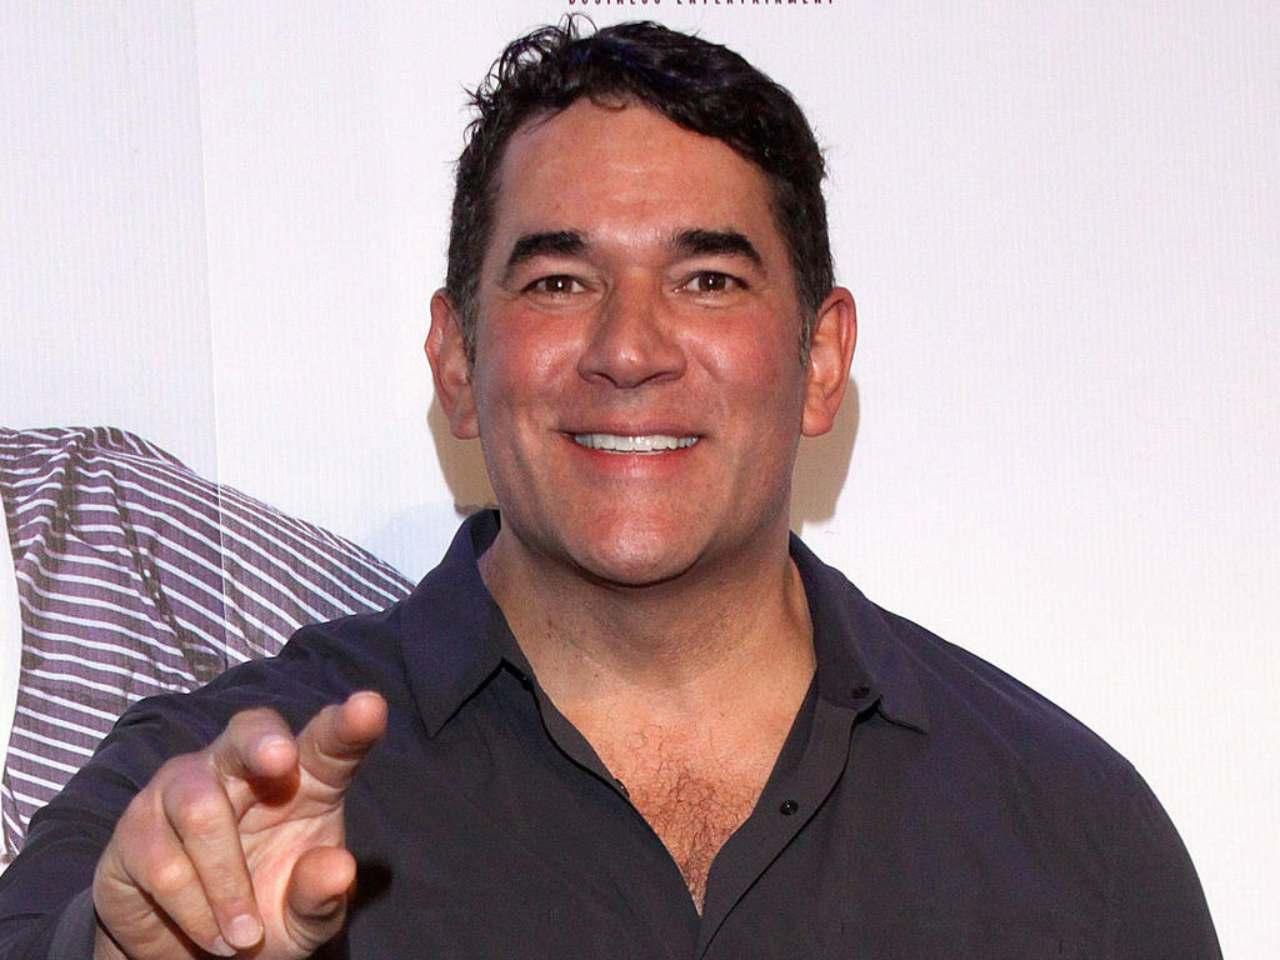 Eduardo Santamarina dice estar subido de peso